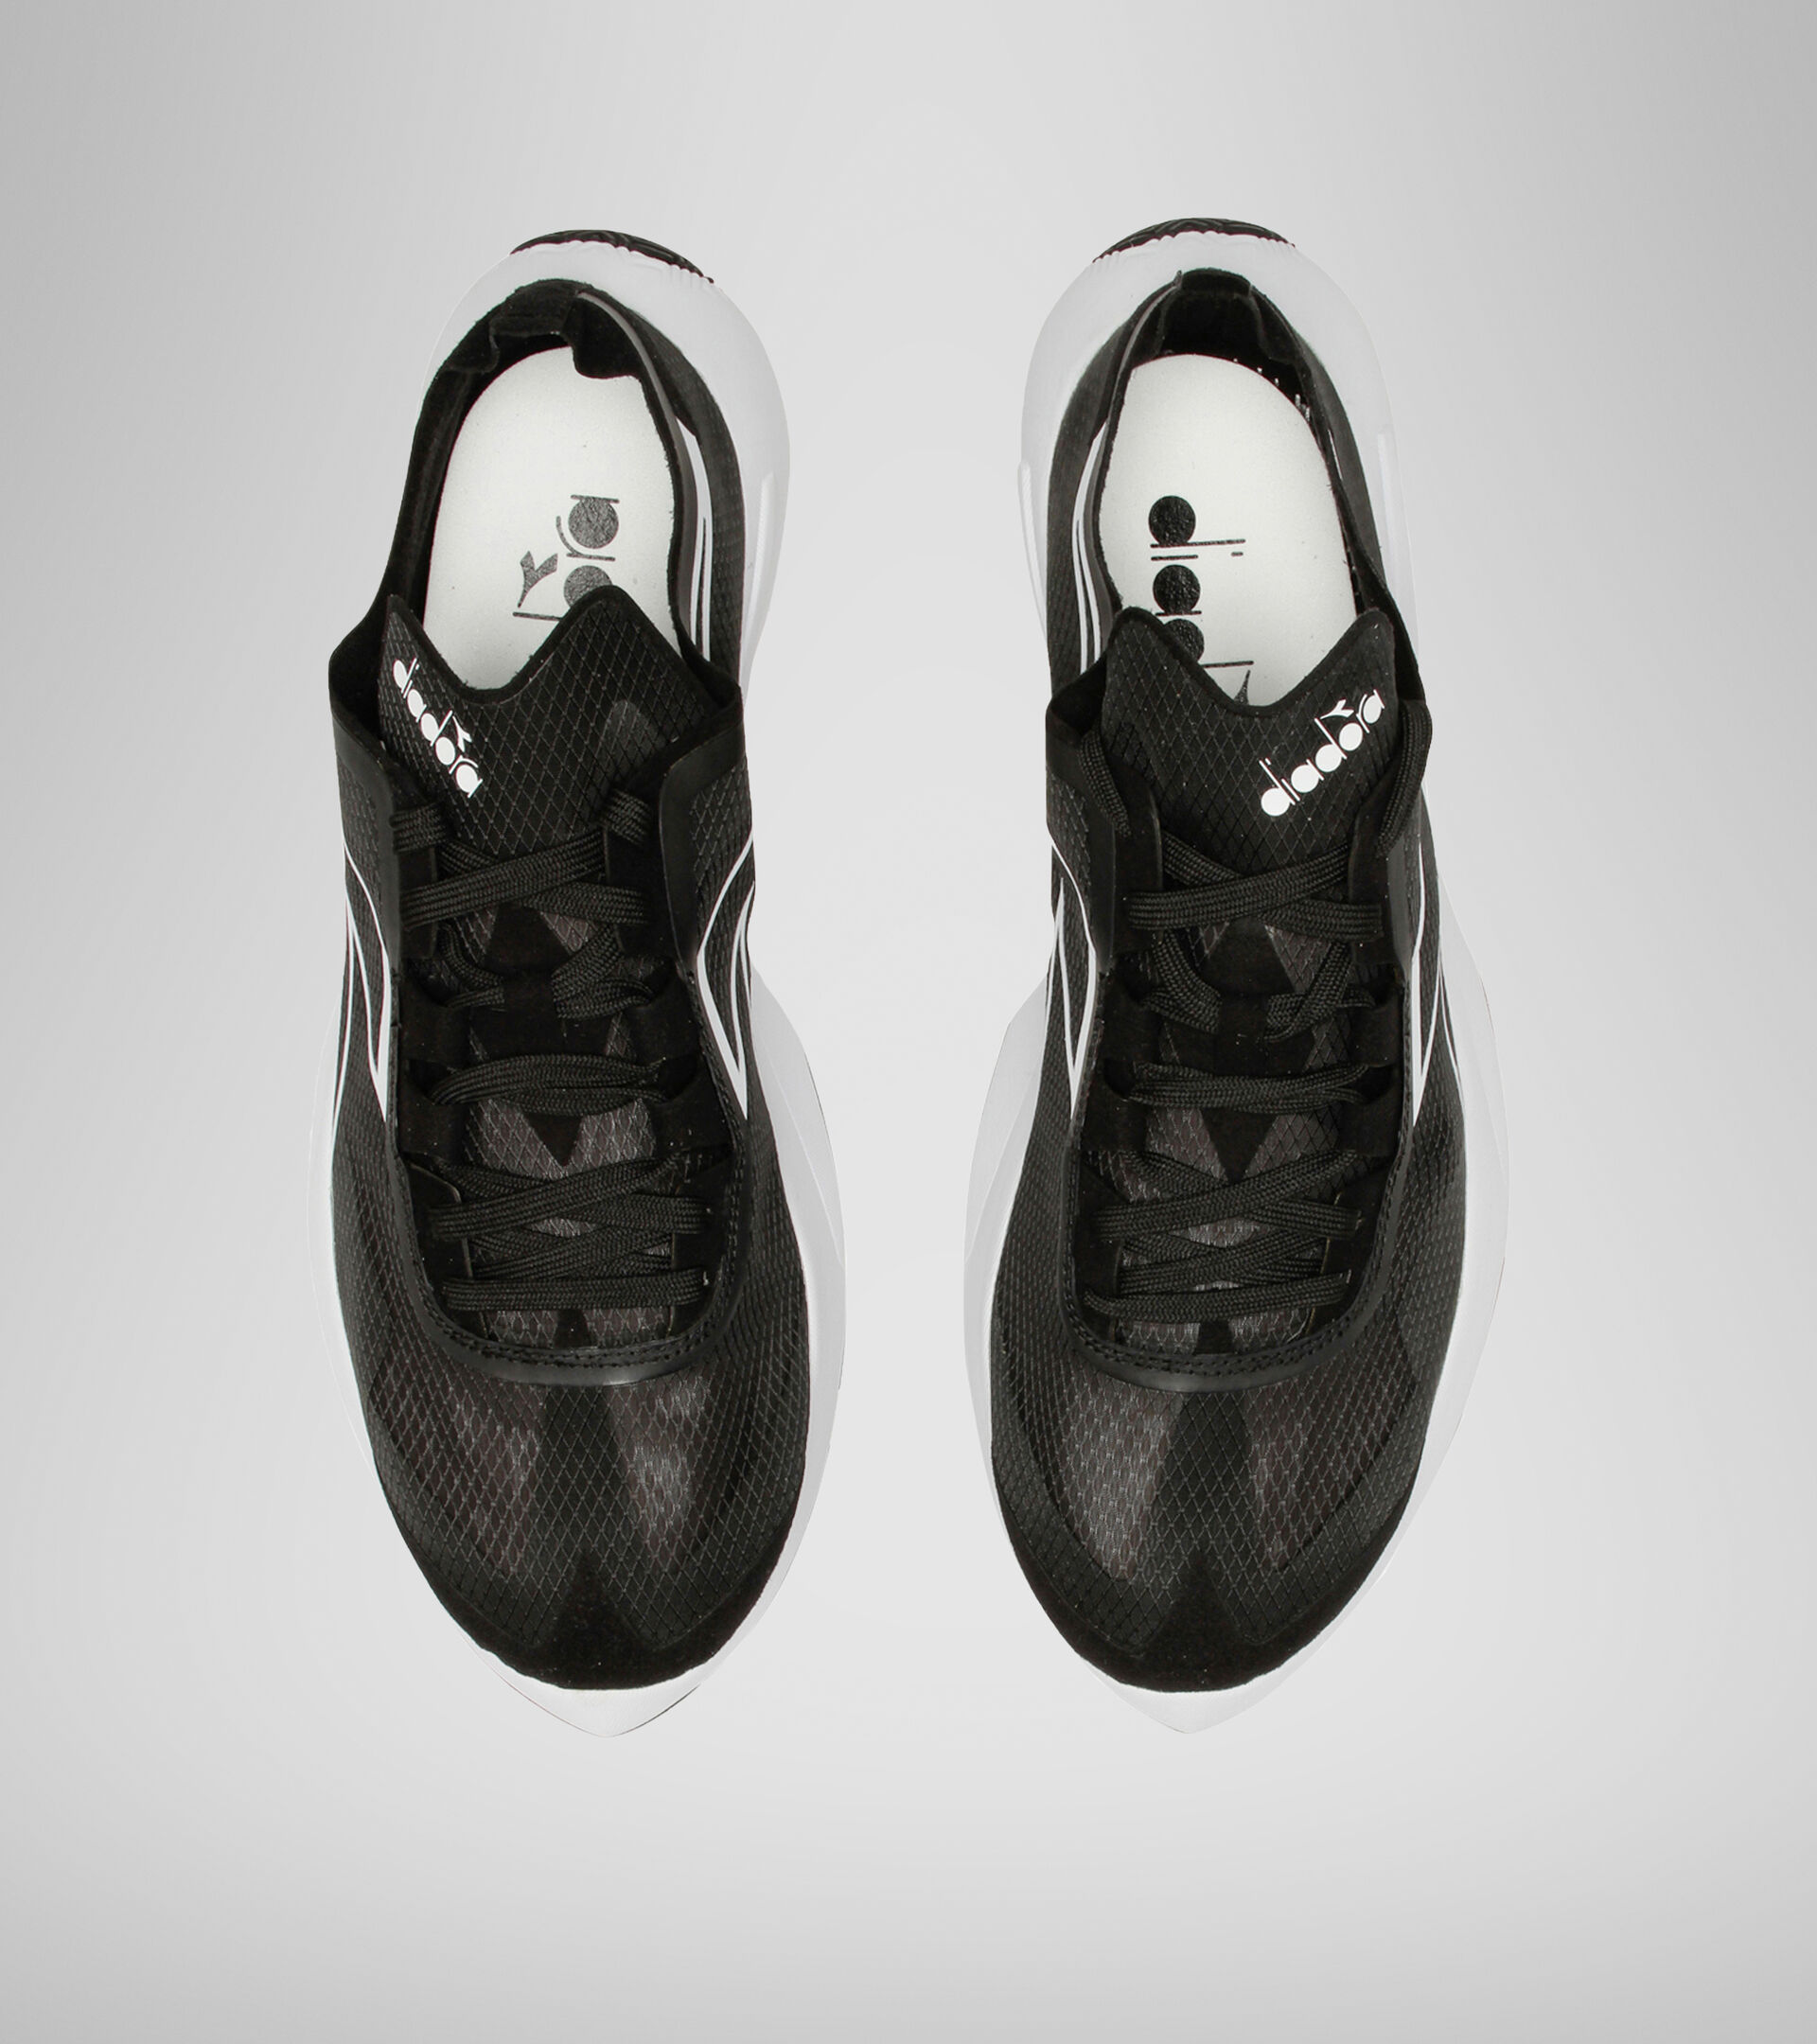 Footwear Sportswear UNISEX URBAN EQUIPE NEGRO Diadora